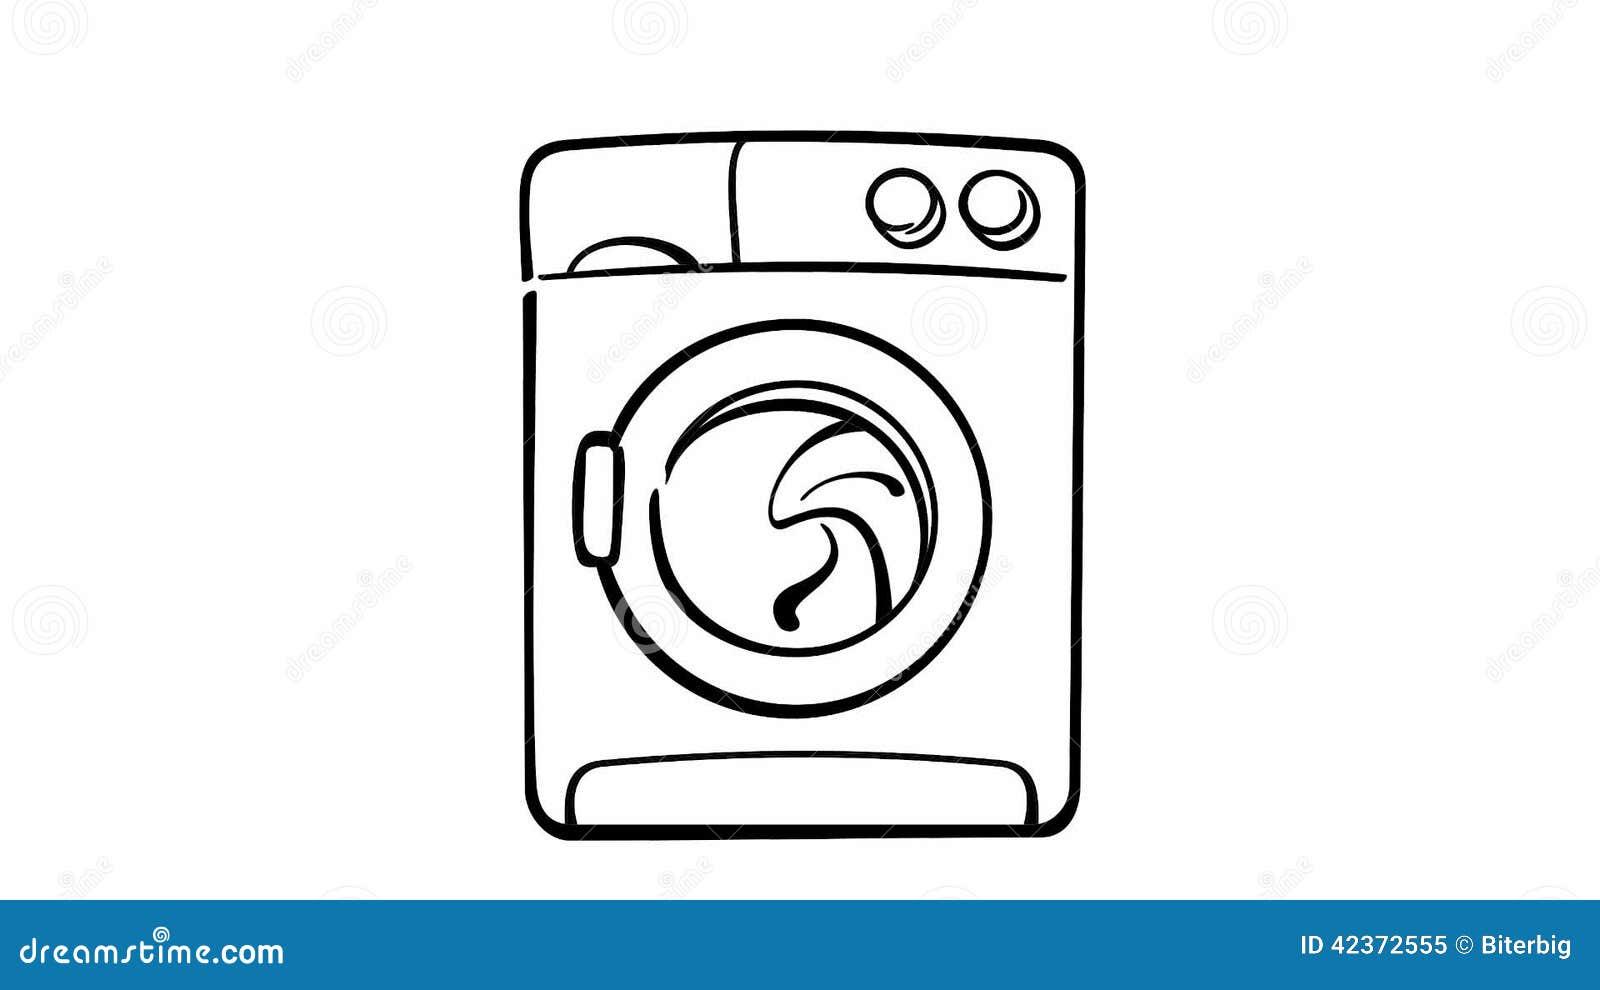 Washing Machine Drawing ~ Washing machine drawing figure a common leak locations